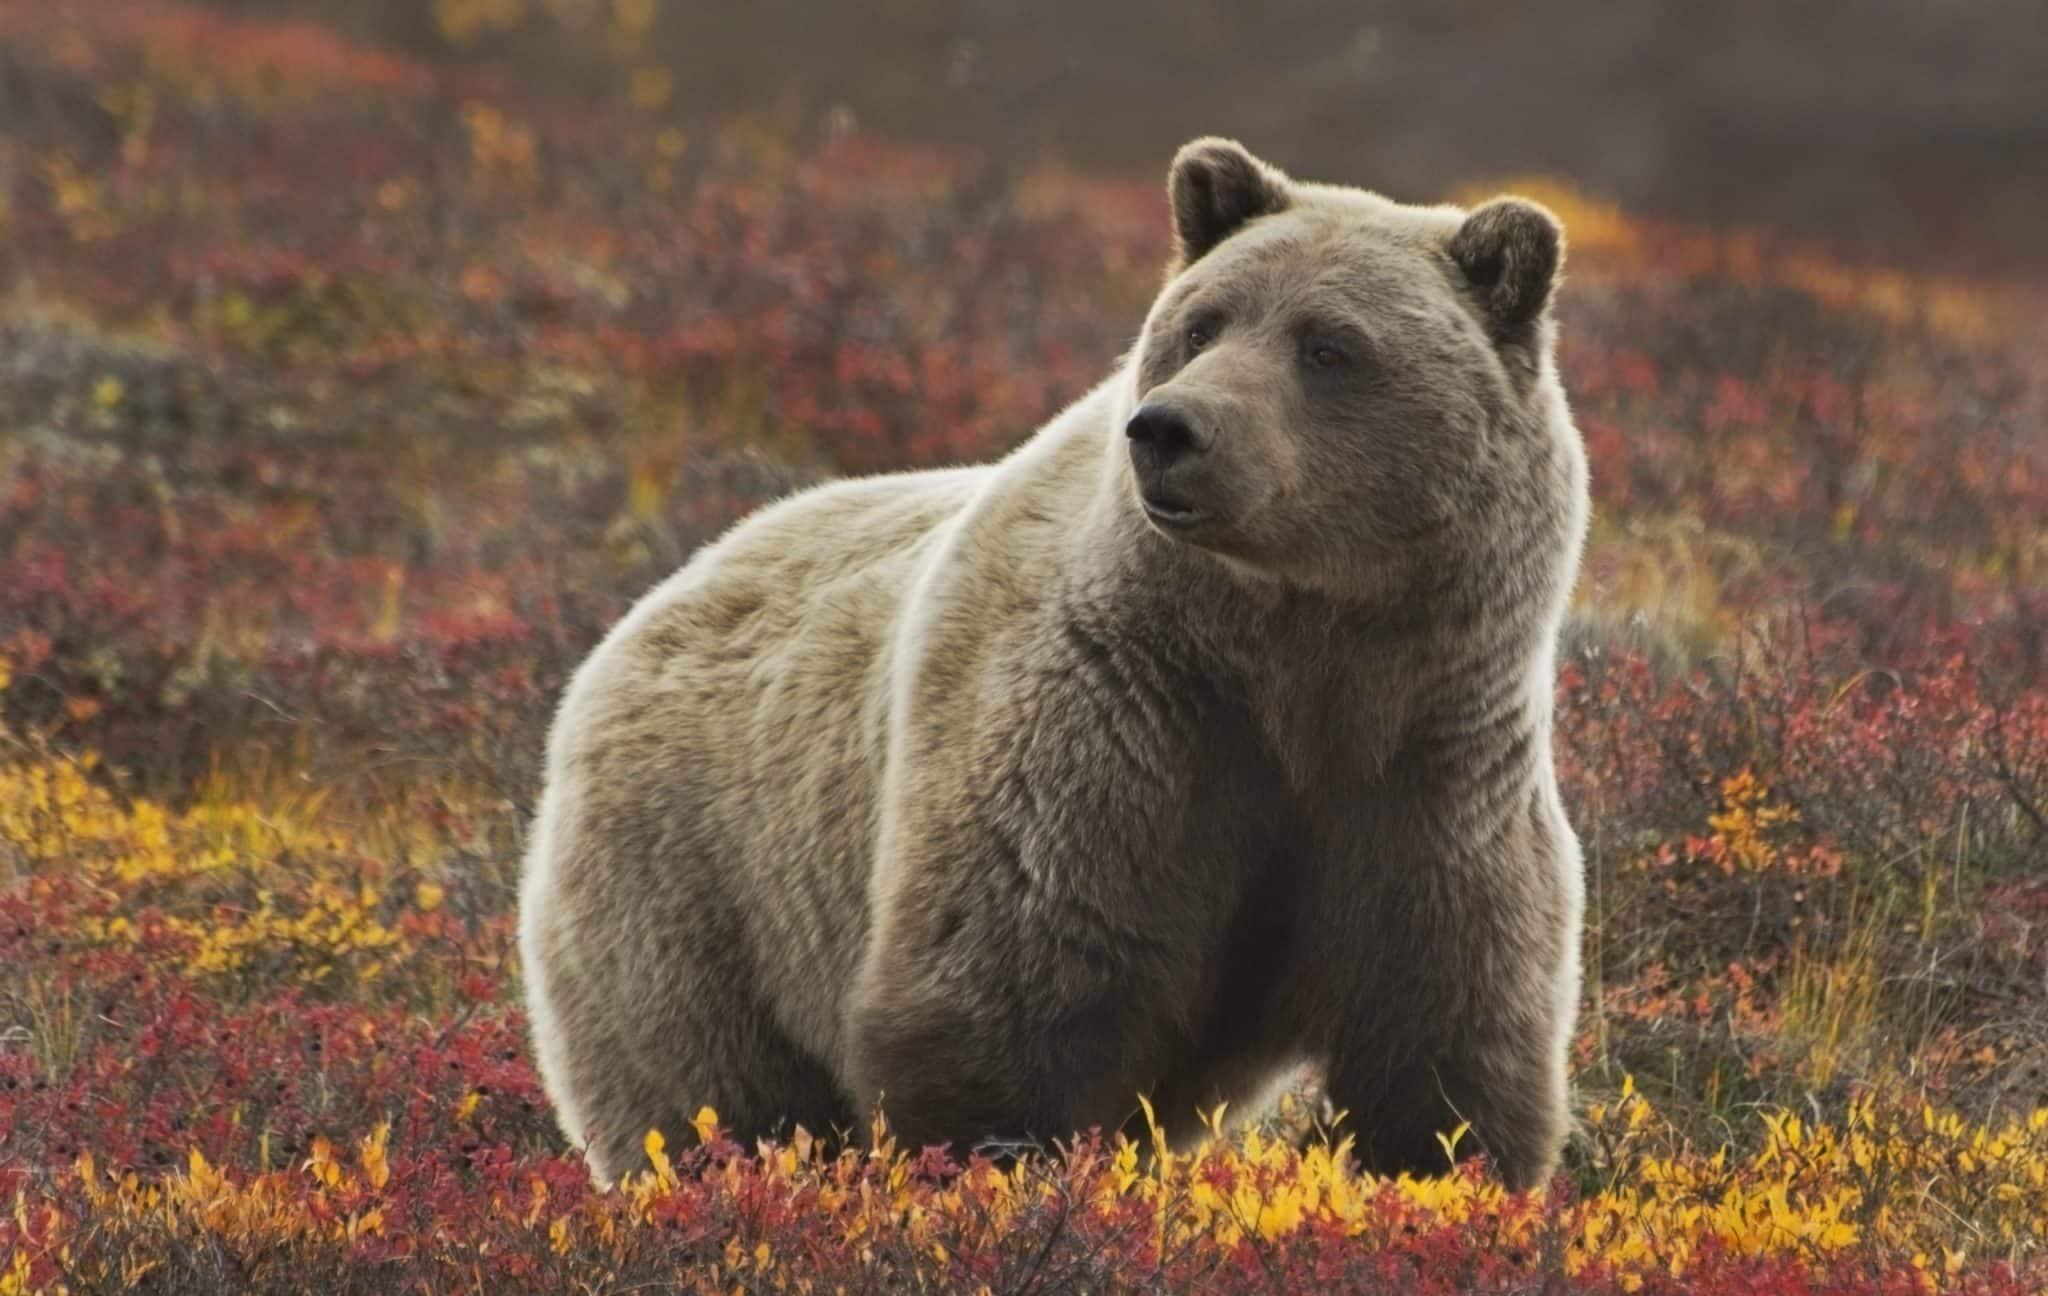 Alaskan Grizzly Bear